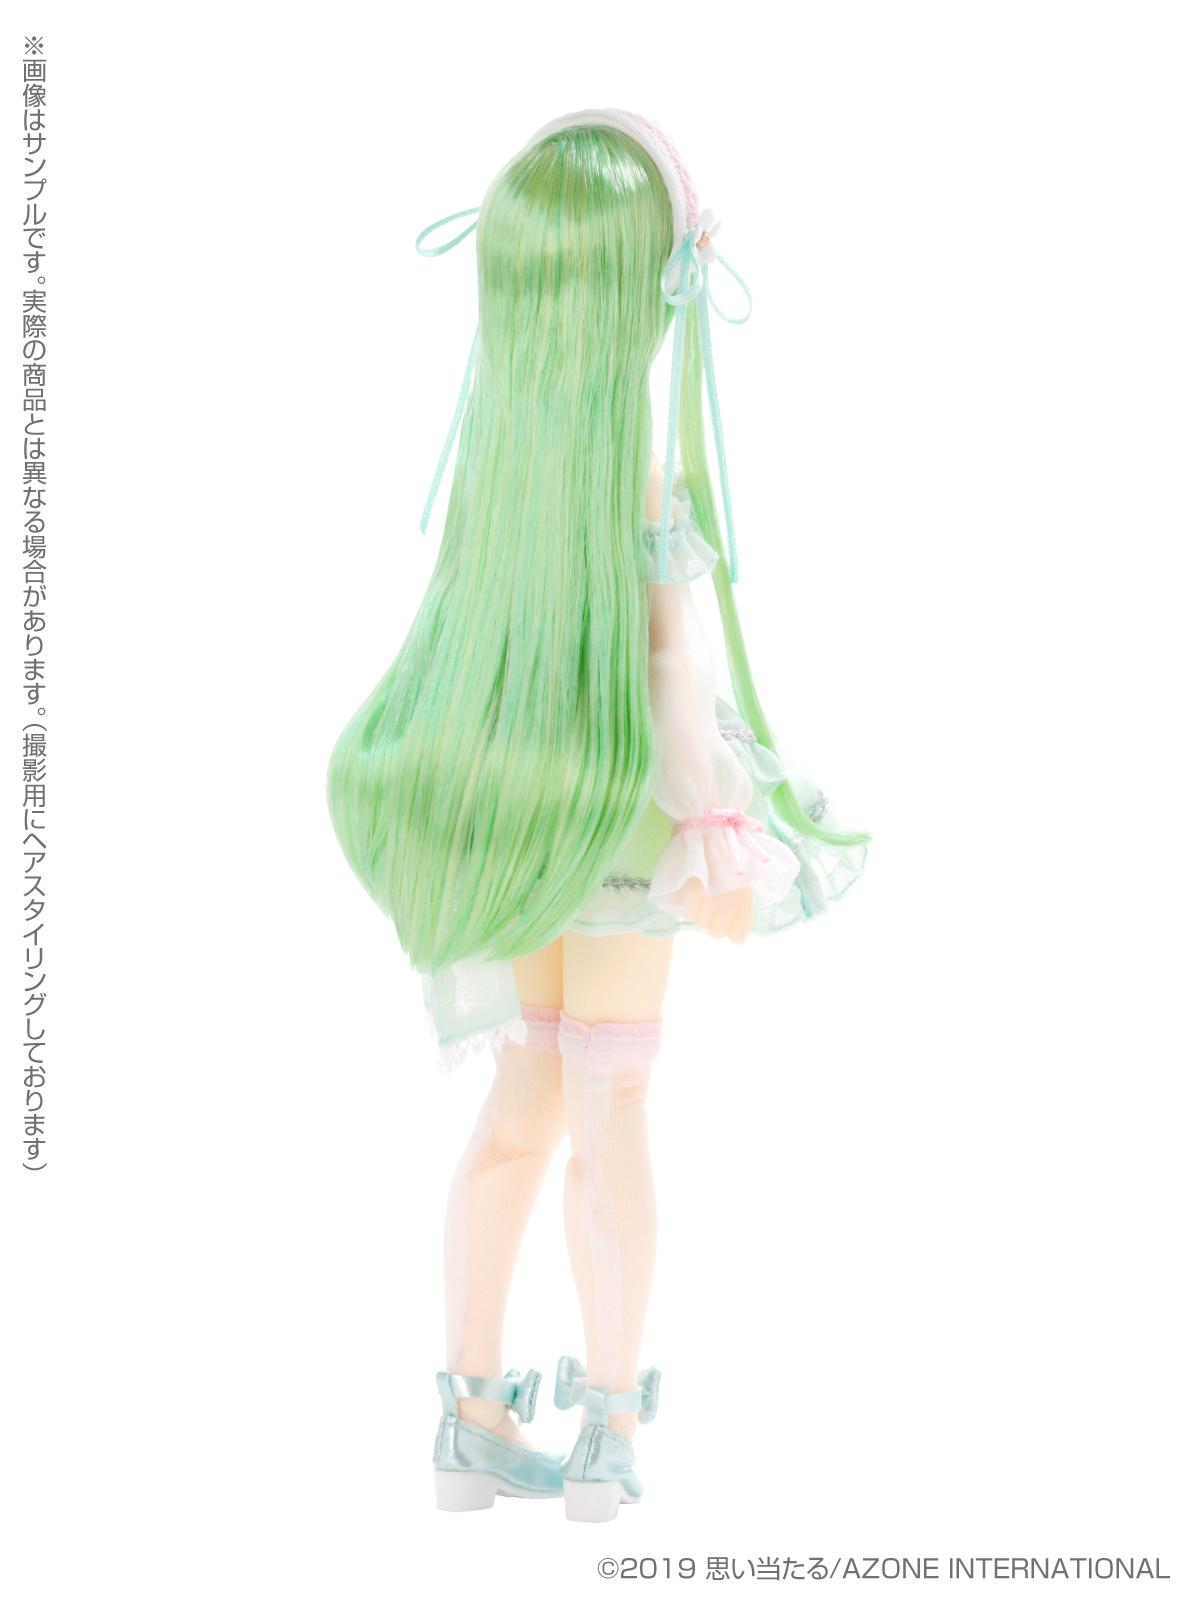 Magical☆CUTE『Floral Ease Miu(みう)』えっくす☆きゅーと 1/6 完成品ドール-005